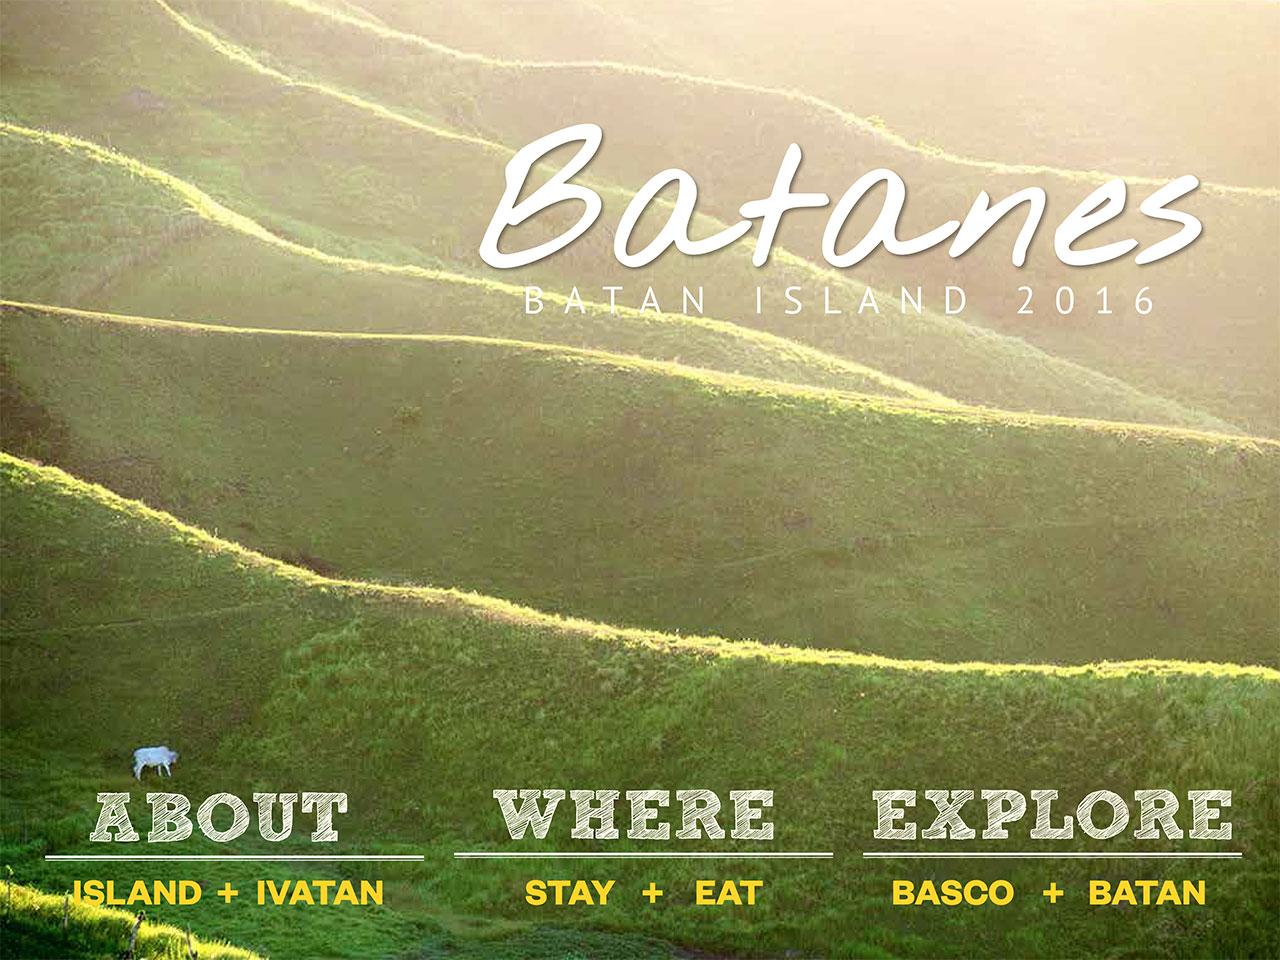 The Batanes Travel Guide Batan Island 2016 Edition